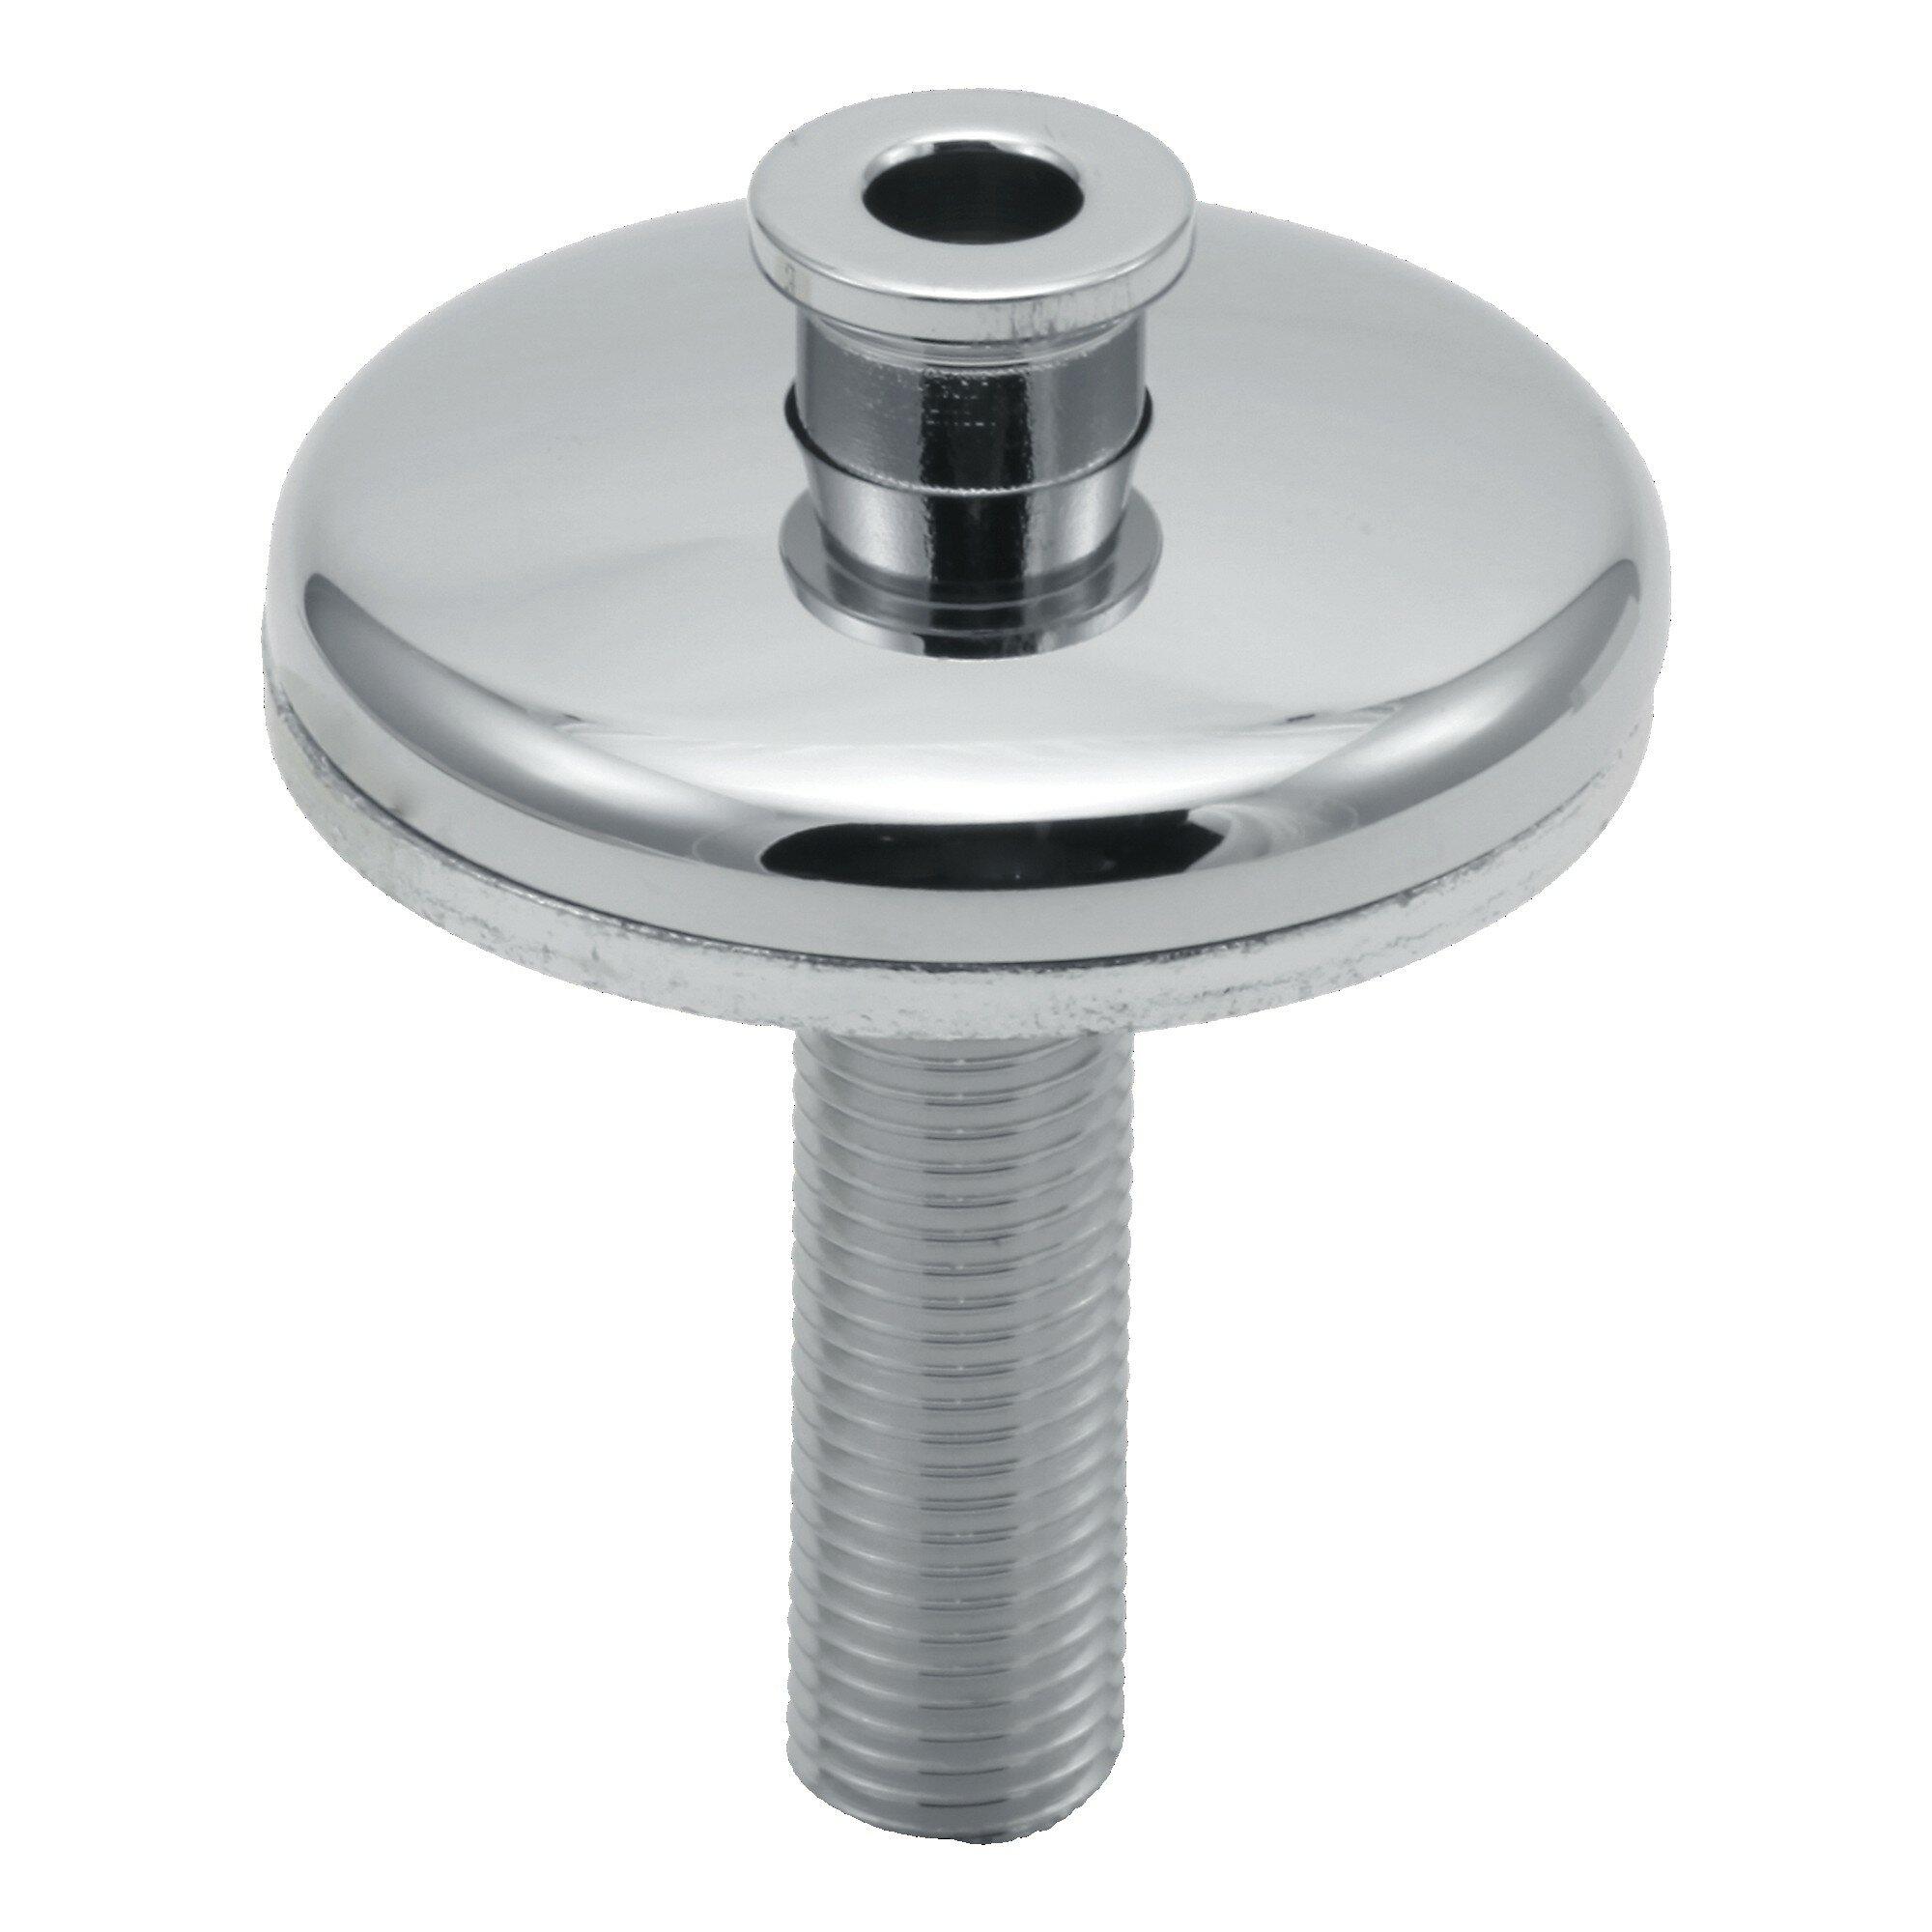 Delta Hub Screw And Nut Bathroom Kitchen Faucet Wayfair